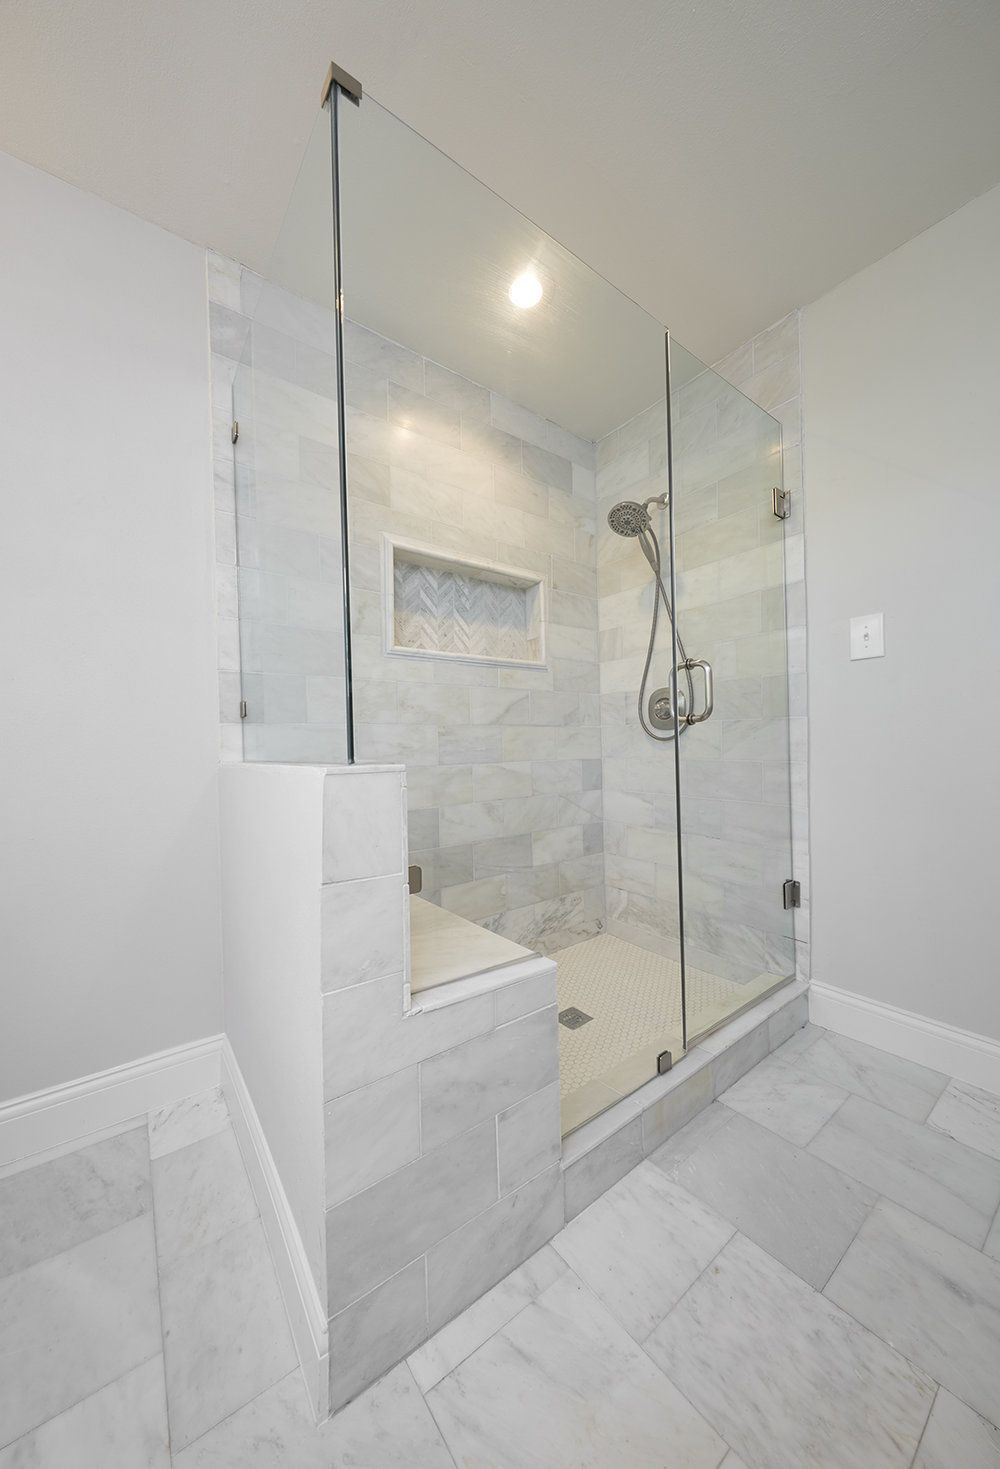 Bathroom Renovation Ideas Bathroom Remodel Cost Bathroom Ideas For Small Bathrooms Small Bathroom Design Ideas Bathroom Remodel Ren Bathroom Remodel Shower